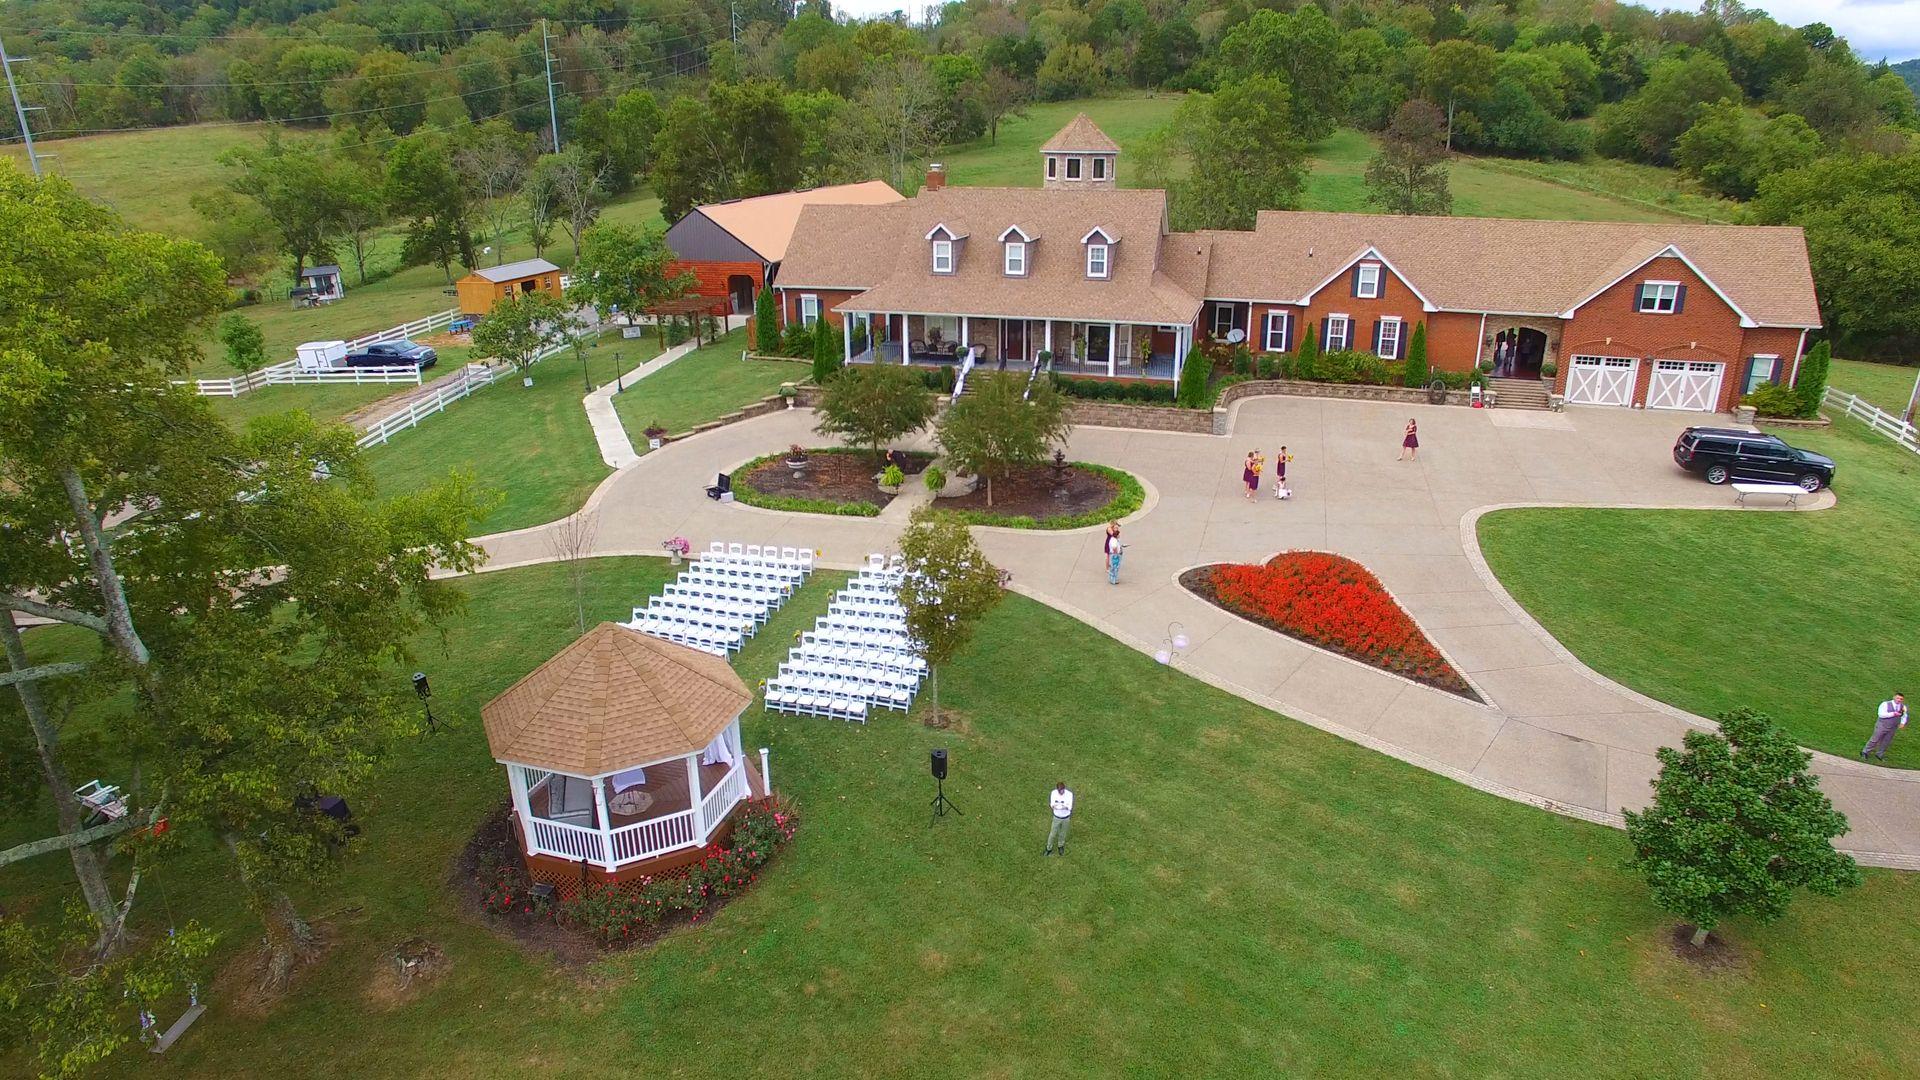 df5ae7ecb94095cb9a99cba1feef5348 - Rock Creek Gardens Condos For Rent